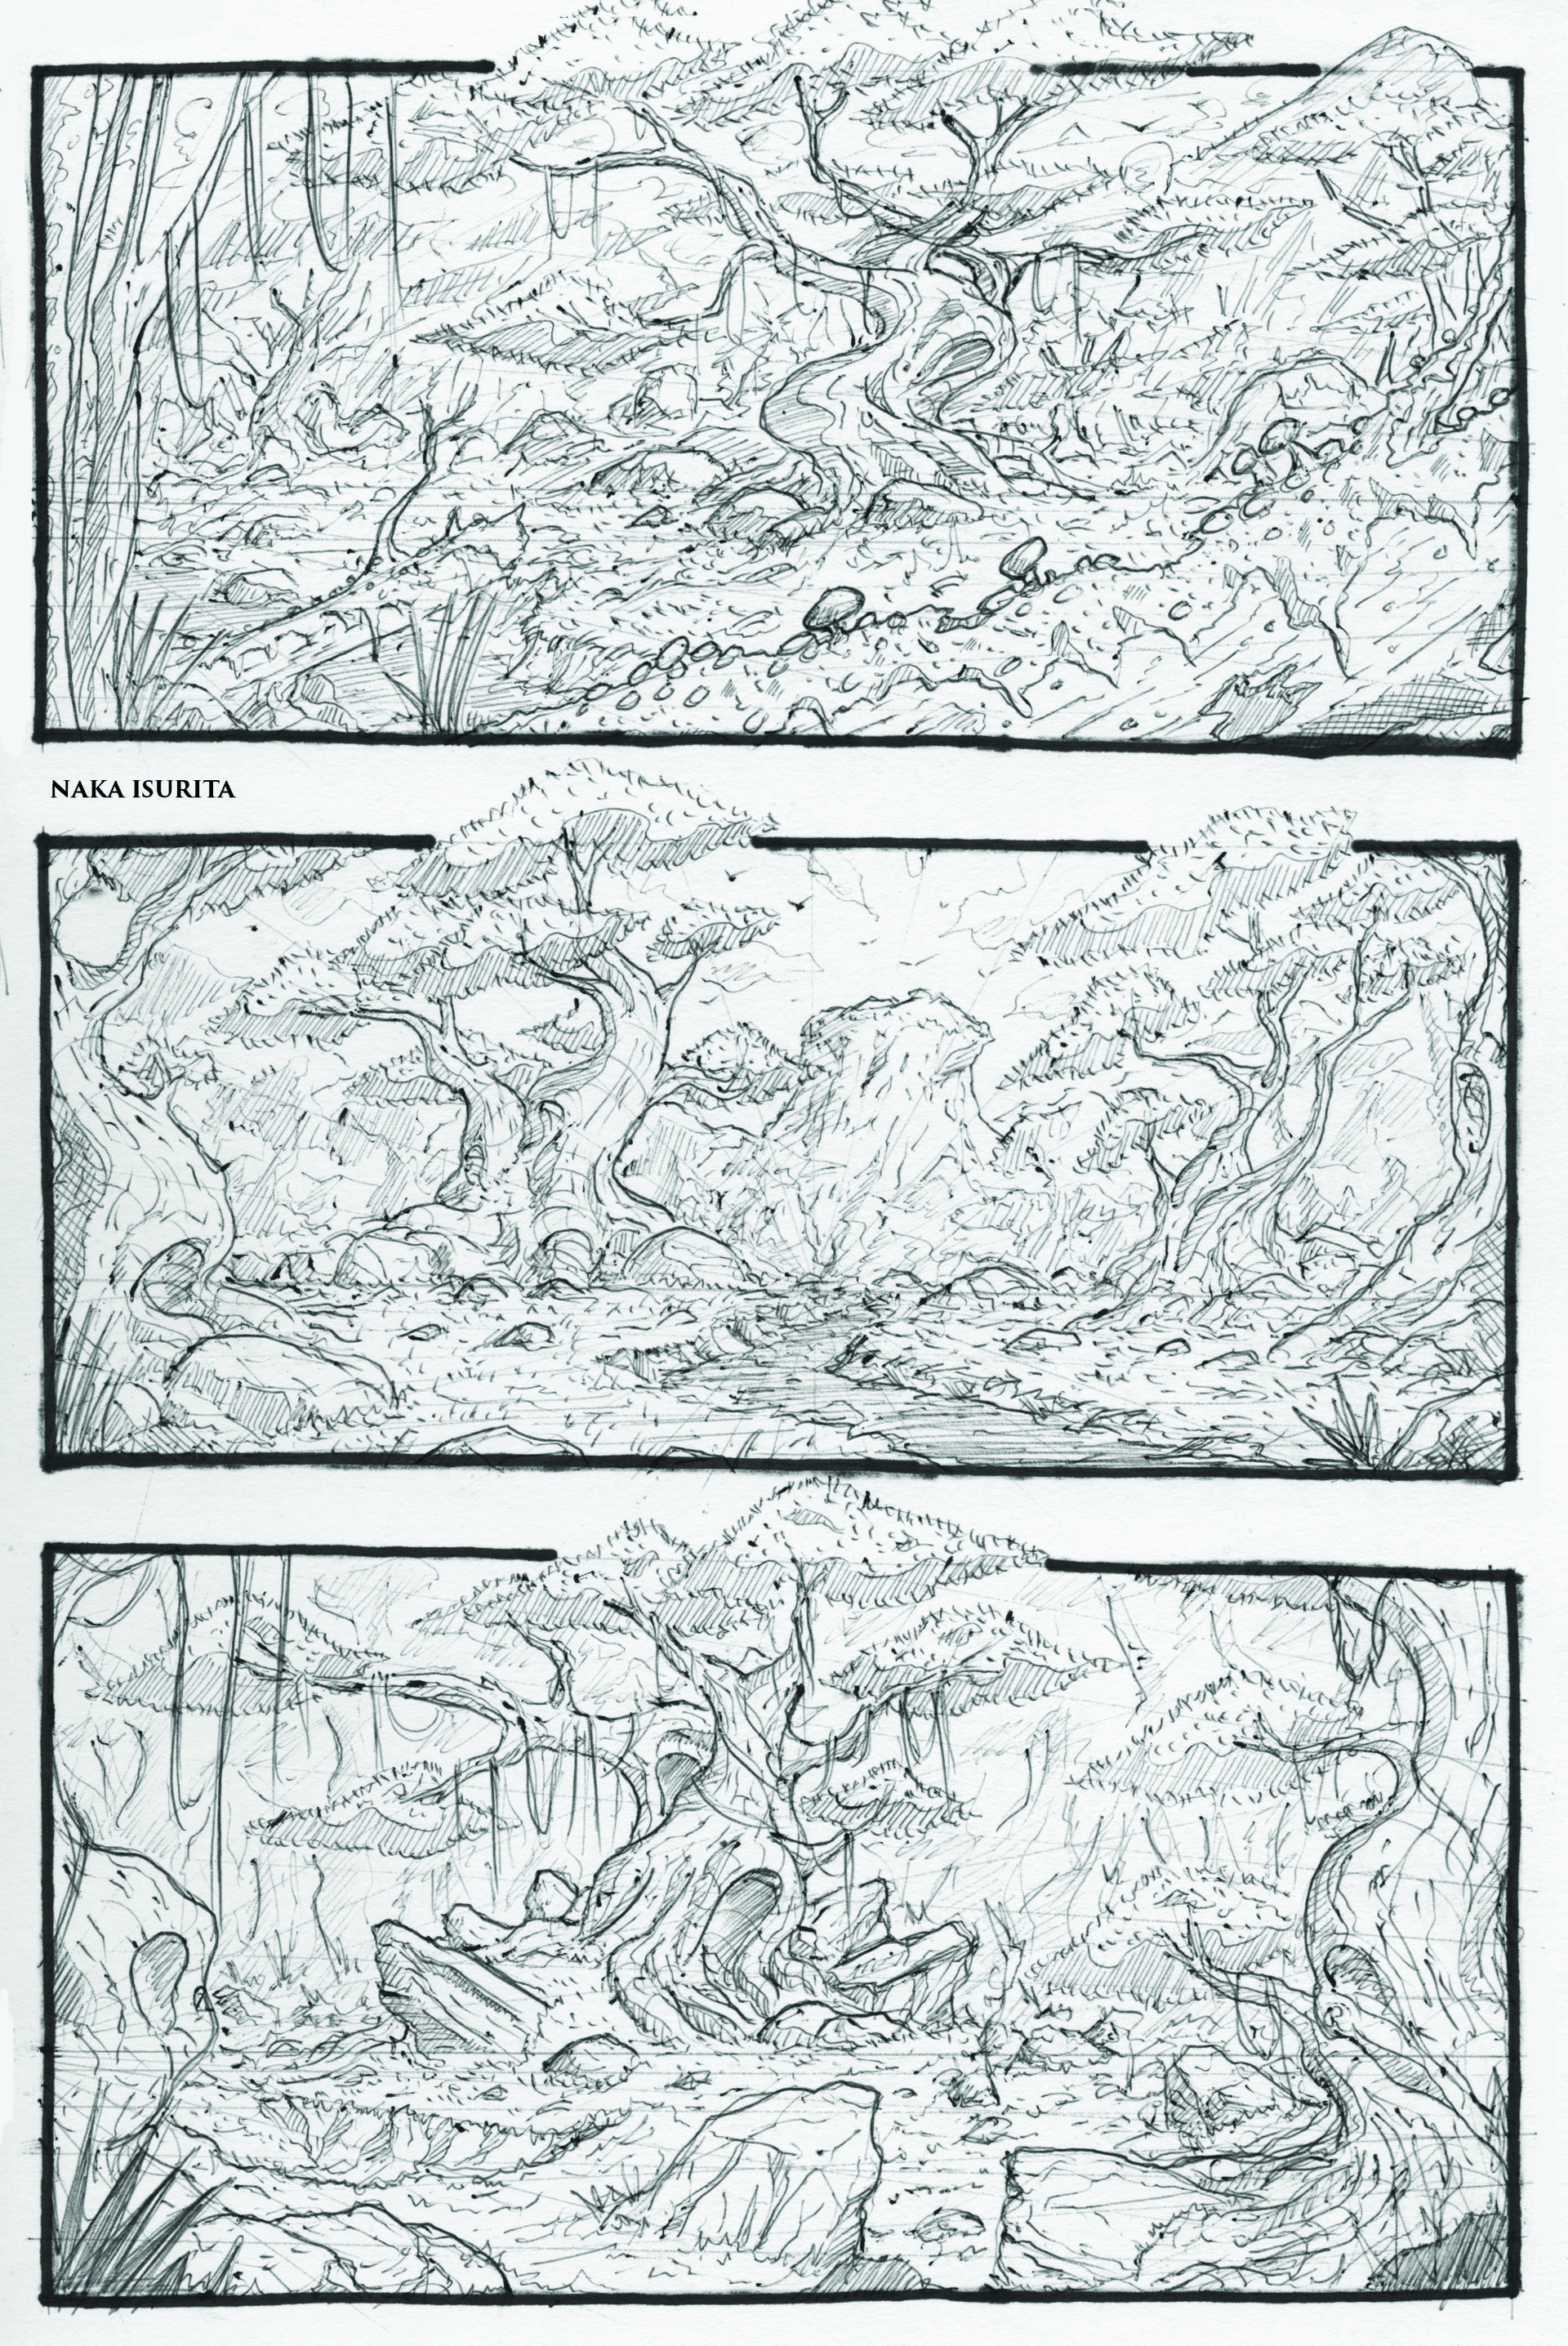 Naka isurita environment sketch 02